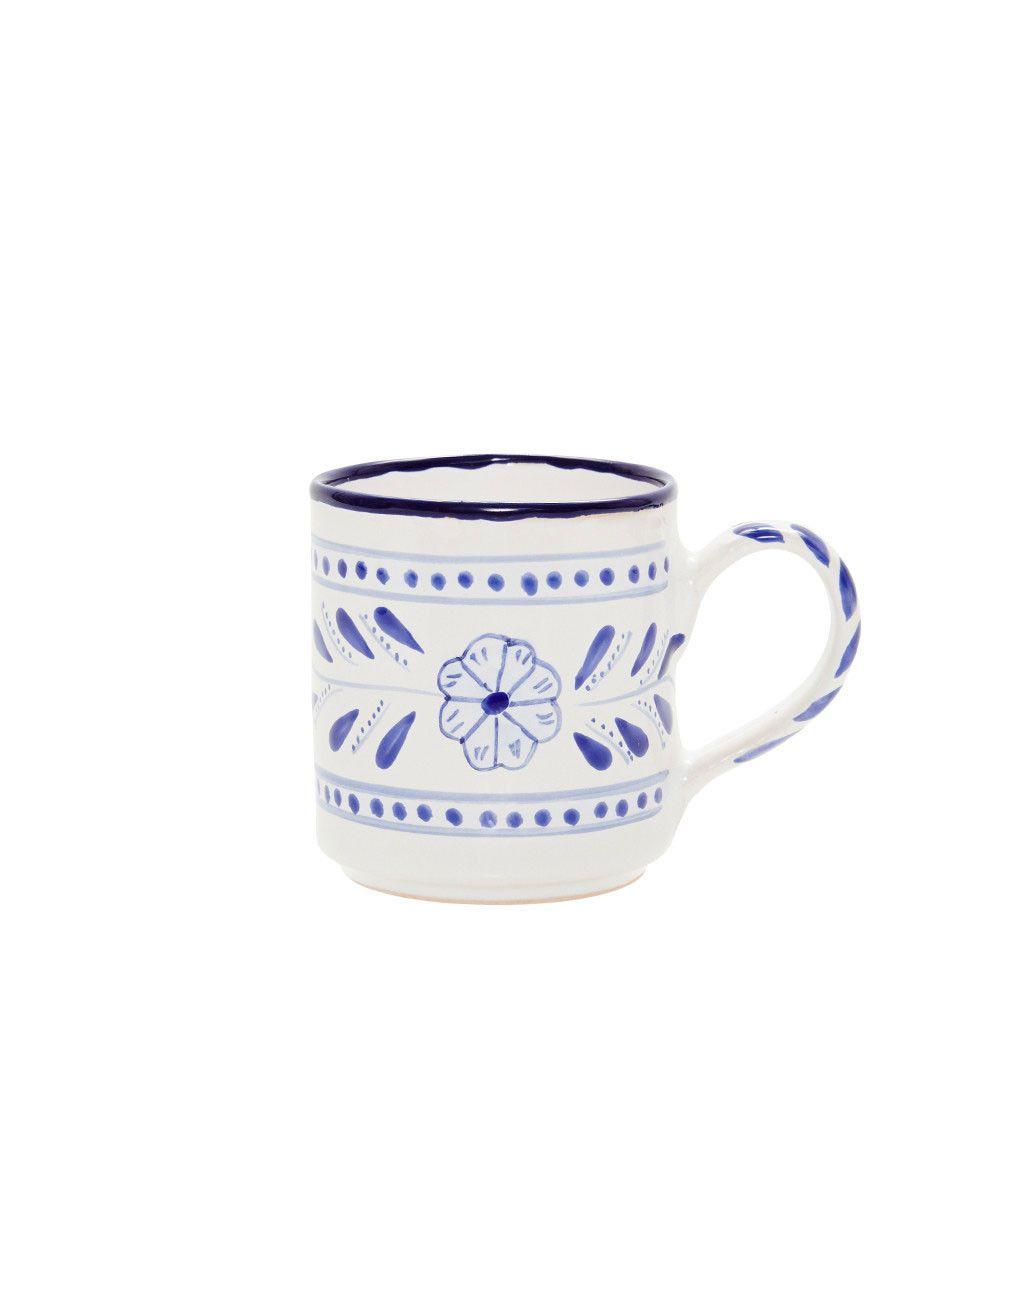 Fair Trade Hand-painted Tunisian Ceramic Coffee, Tea Mug | Blue Floral – The Little Market